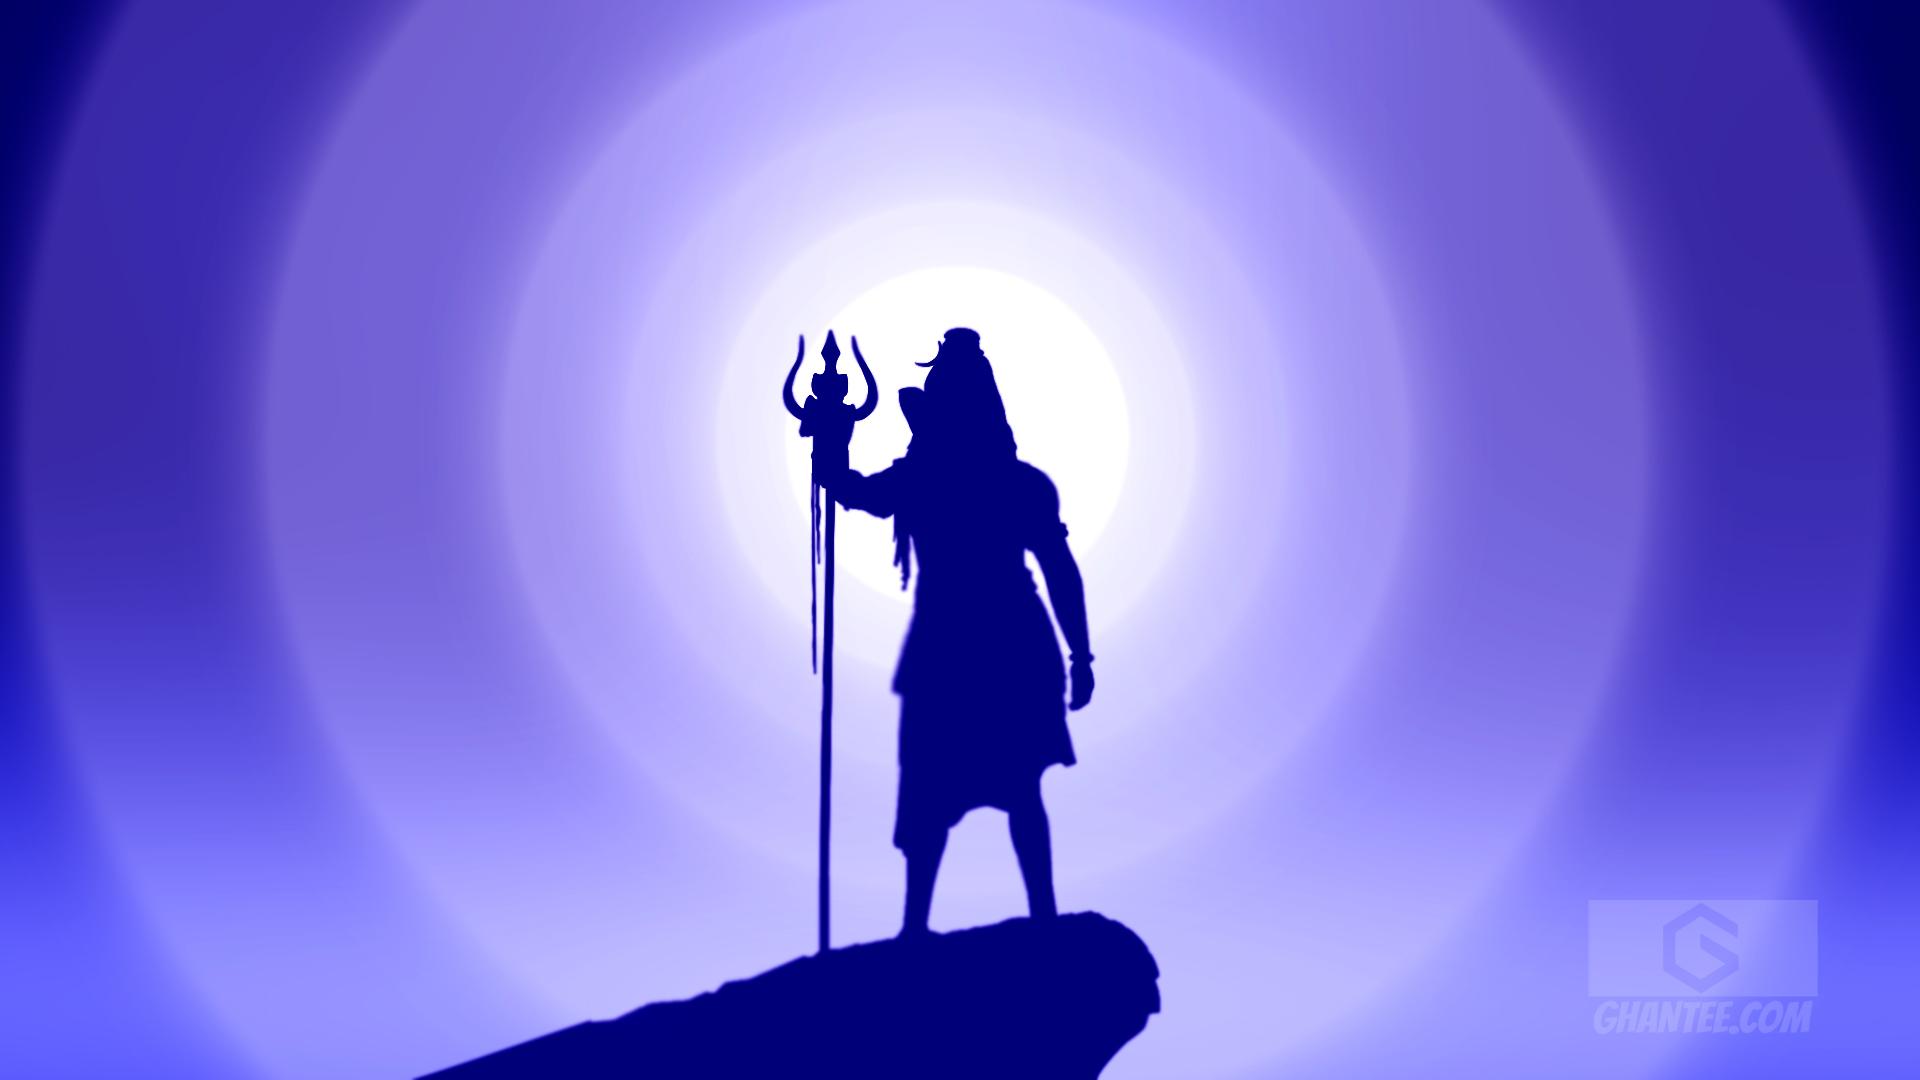 lord shiva silhouette hd laptop wallpaper 1080p